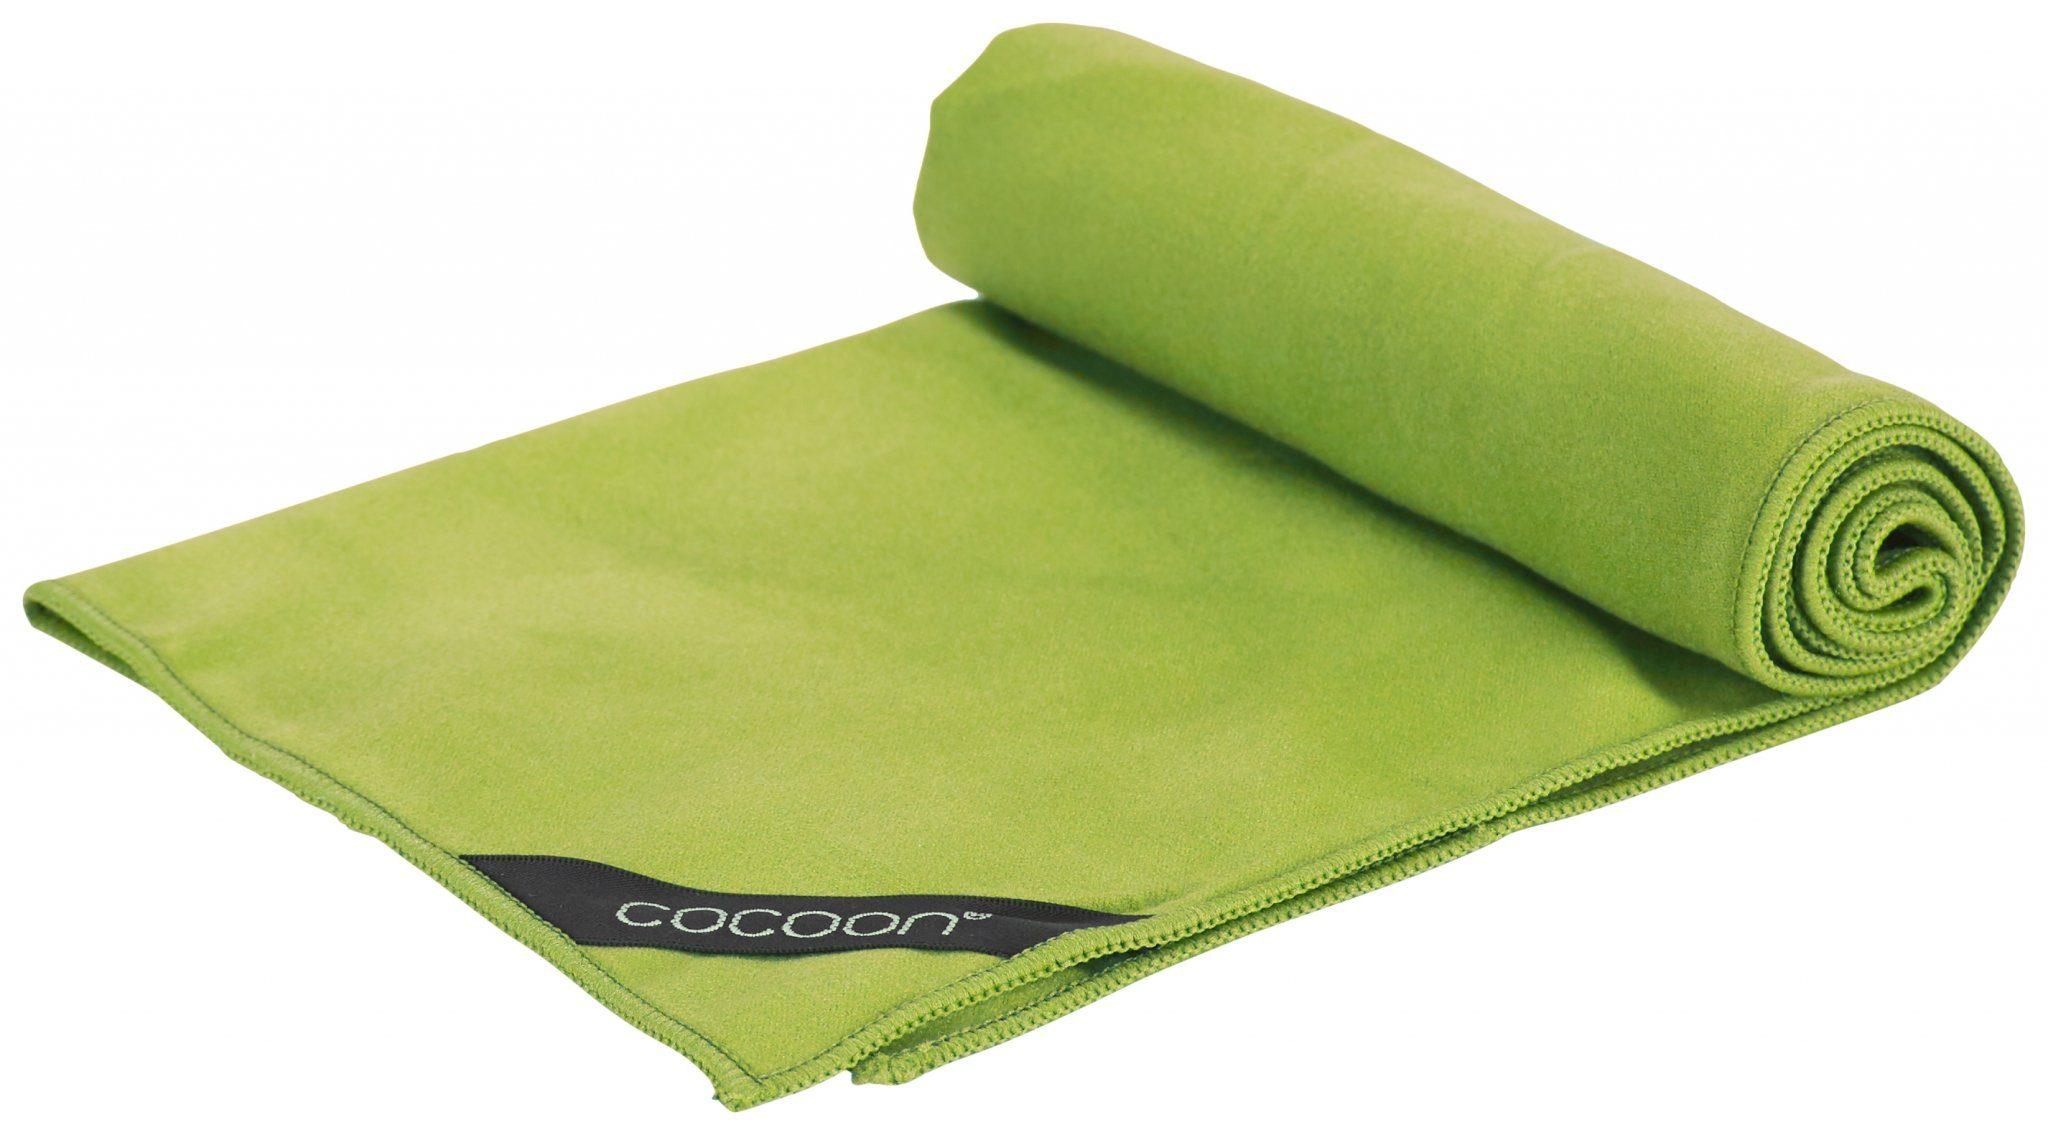 Cocoon Reisehandtuch »Microfiber Towel«